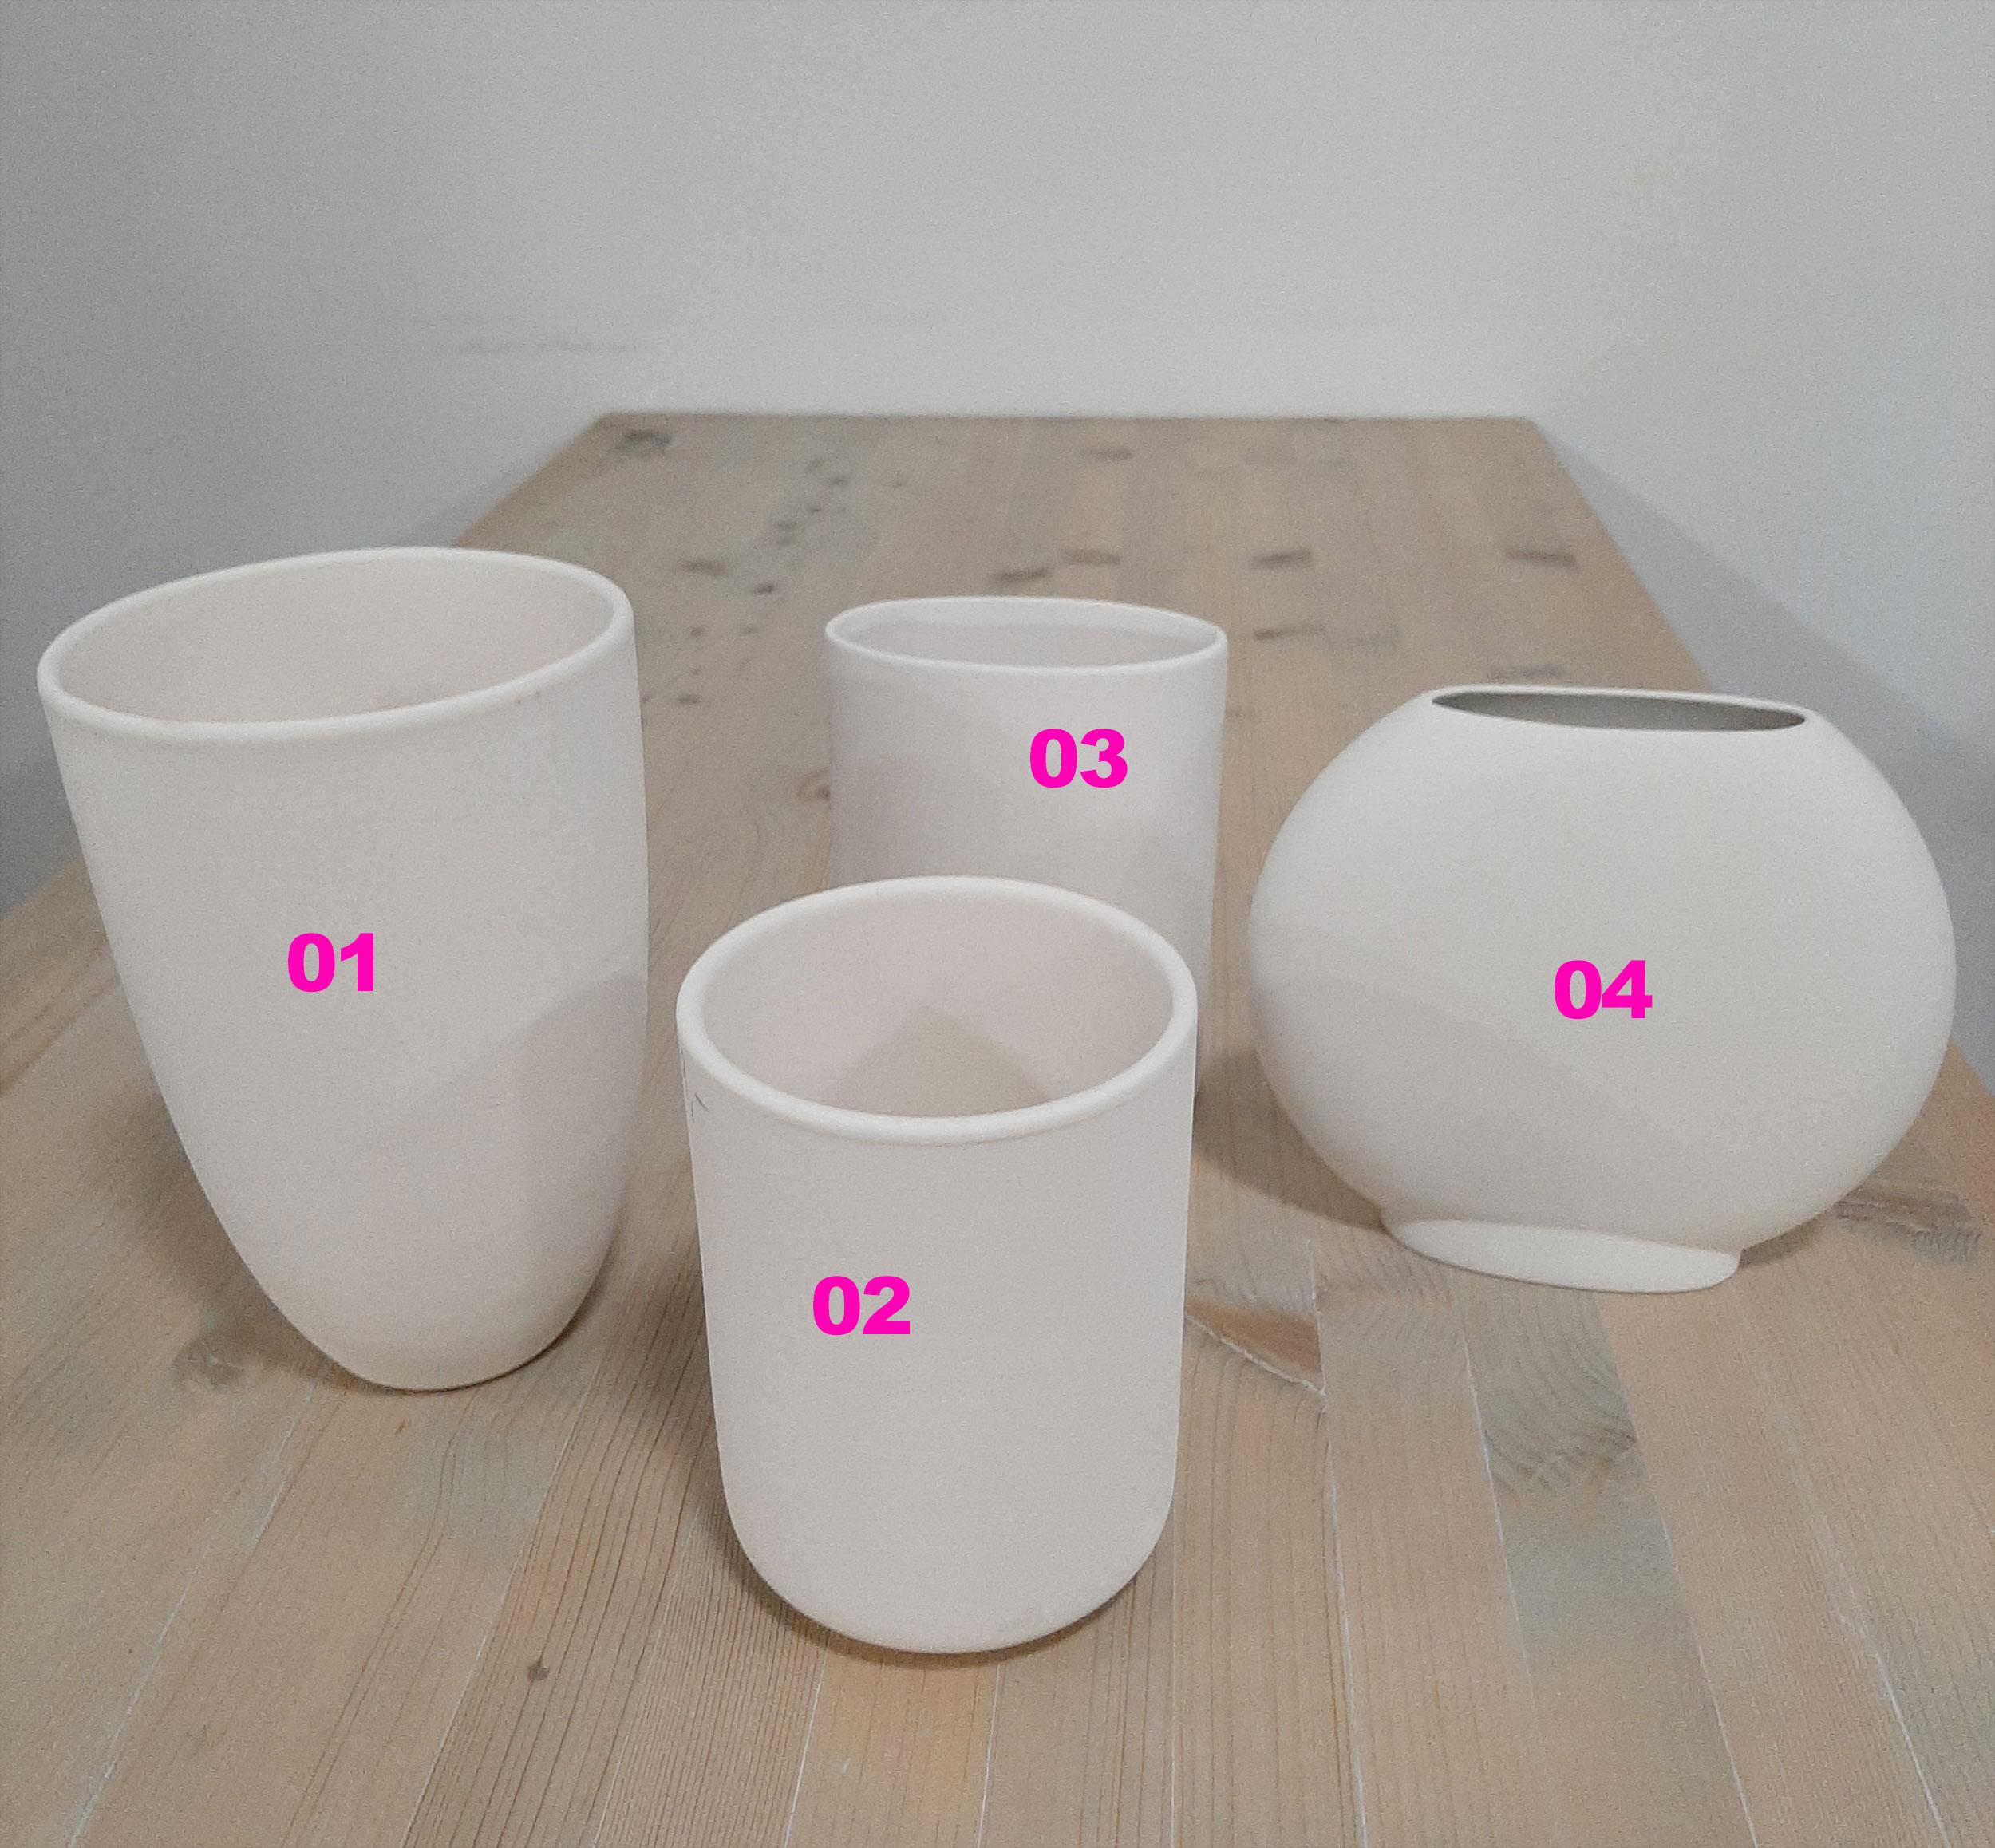 Große Vasen im Kermaik-Malstudio Eigenlob